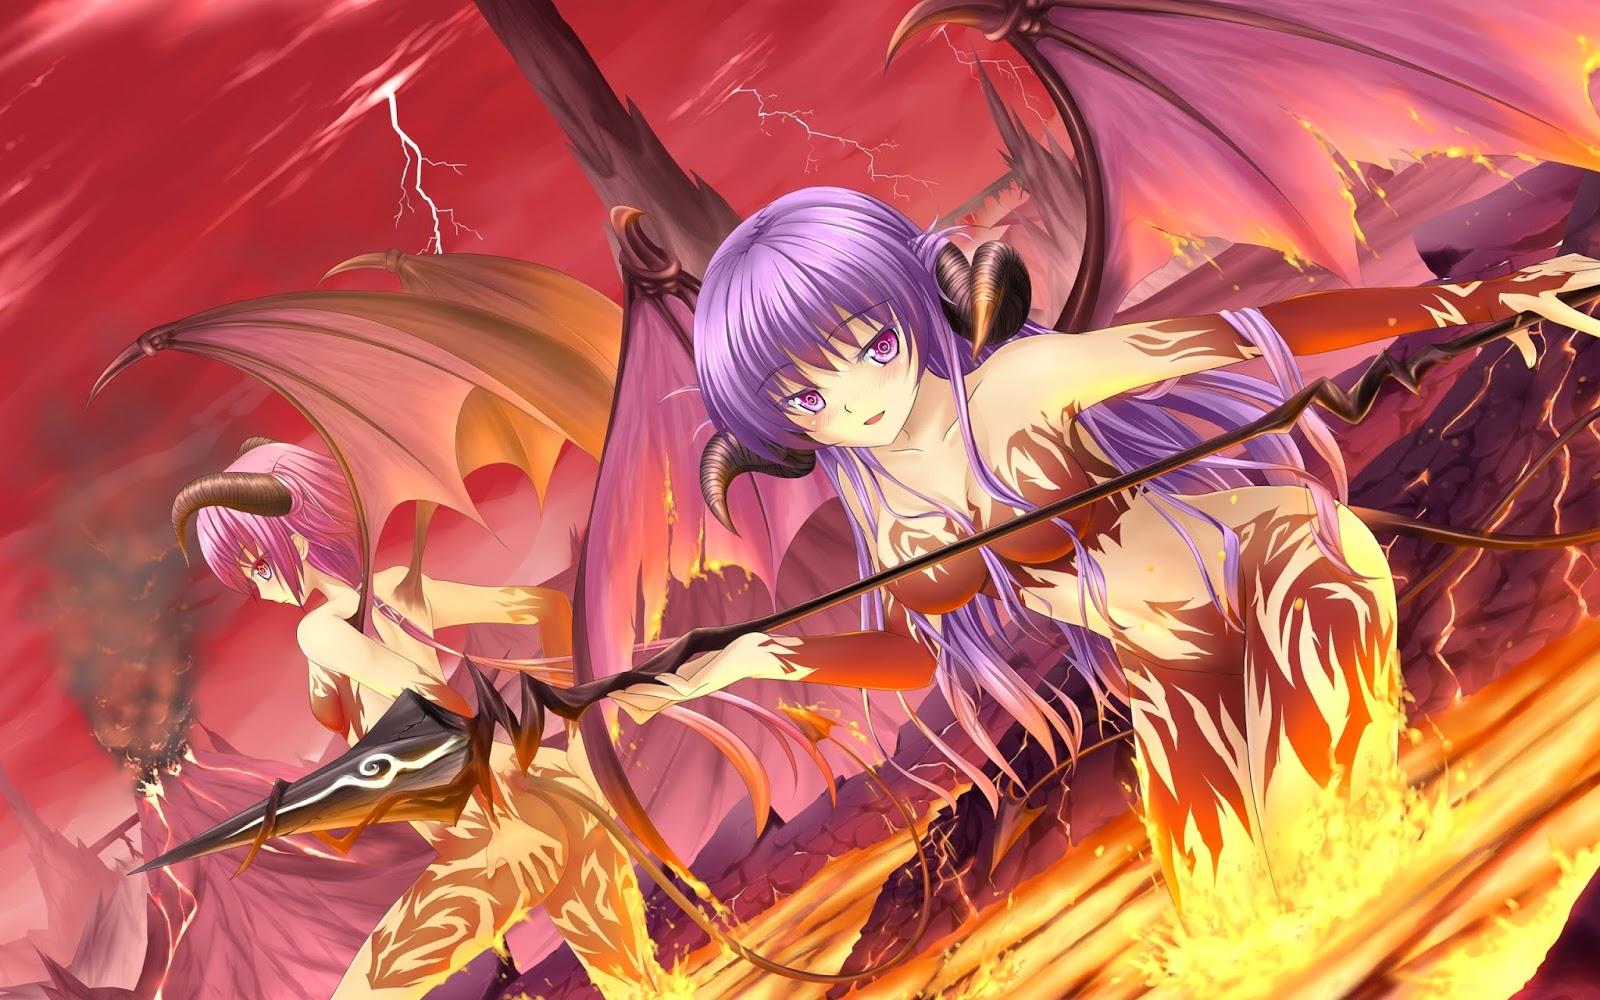 Футанари демоны 3d 17 фотография